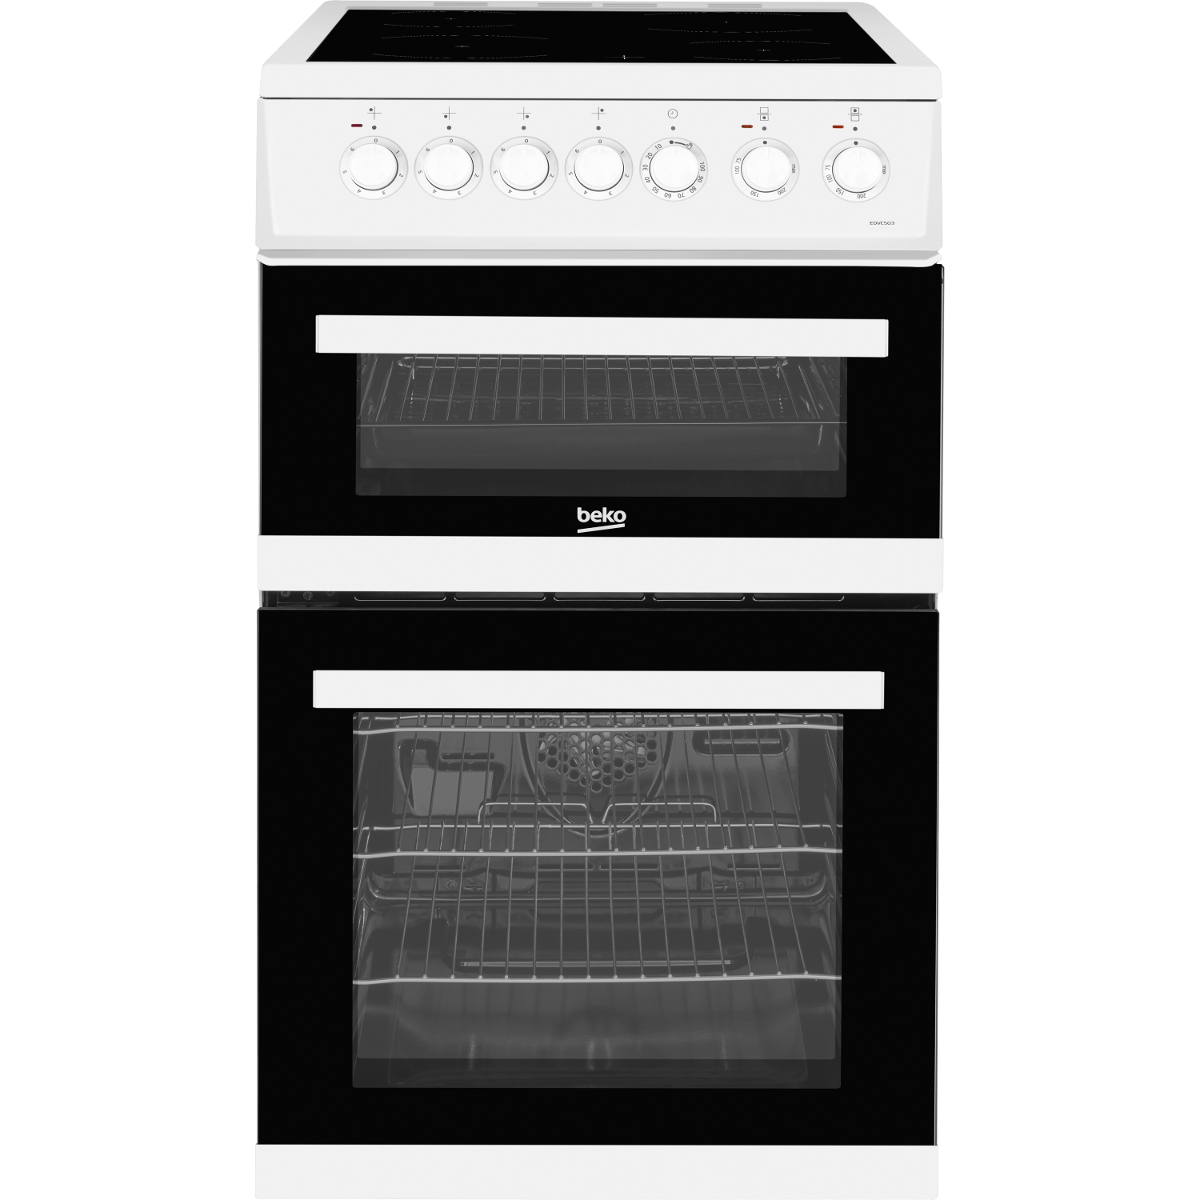 buy beko edvc503w 50cm double oven electric cooker. Black Bedroom Furniture Sets. Home Design Ideas